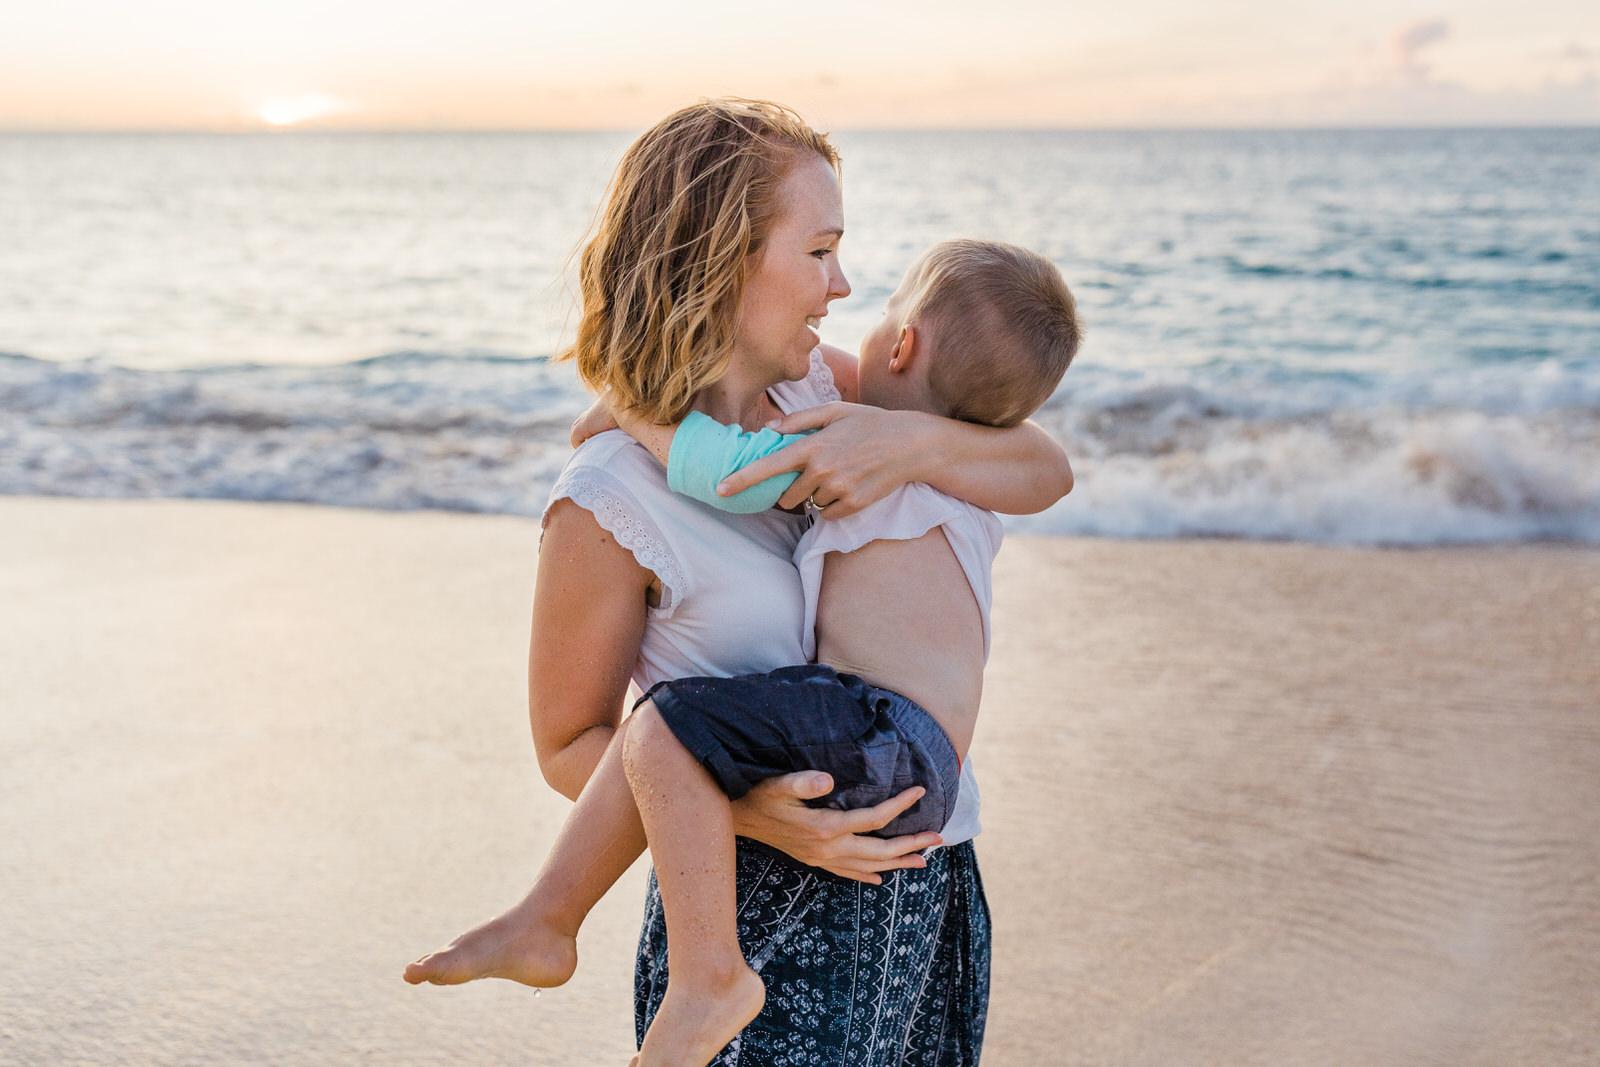 extended-family-big-island-vacation-cousins-grandparents-beach-waikoloa-sunset-hawaii-7289.jpg